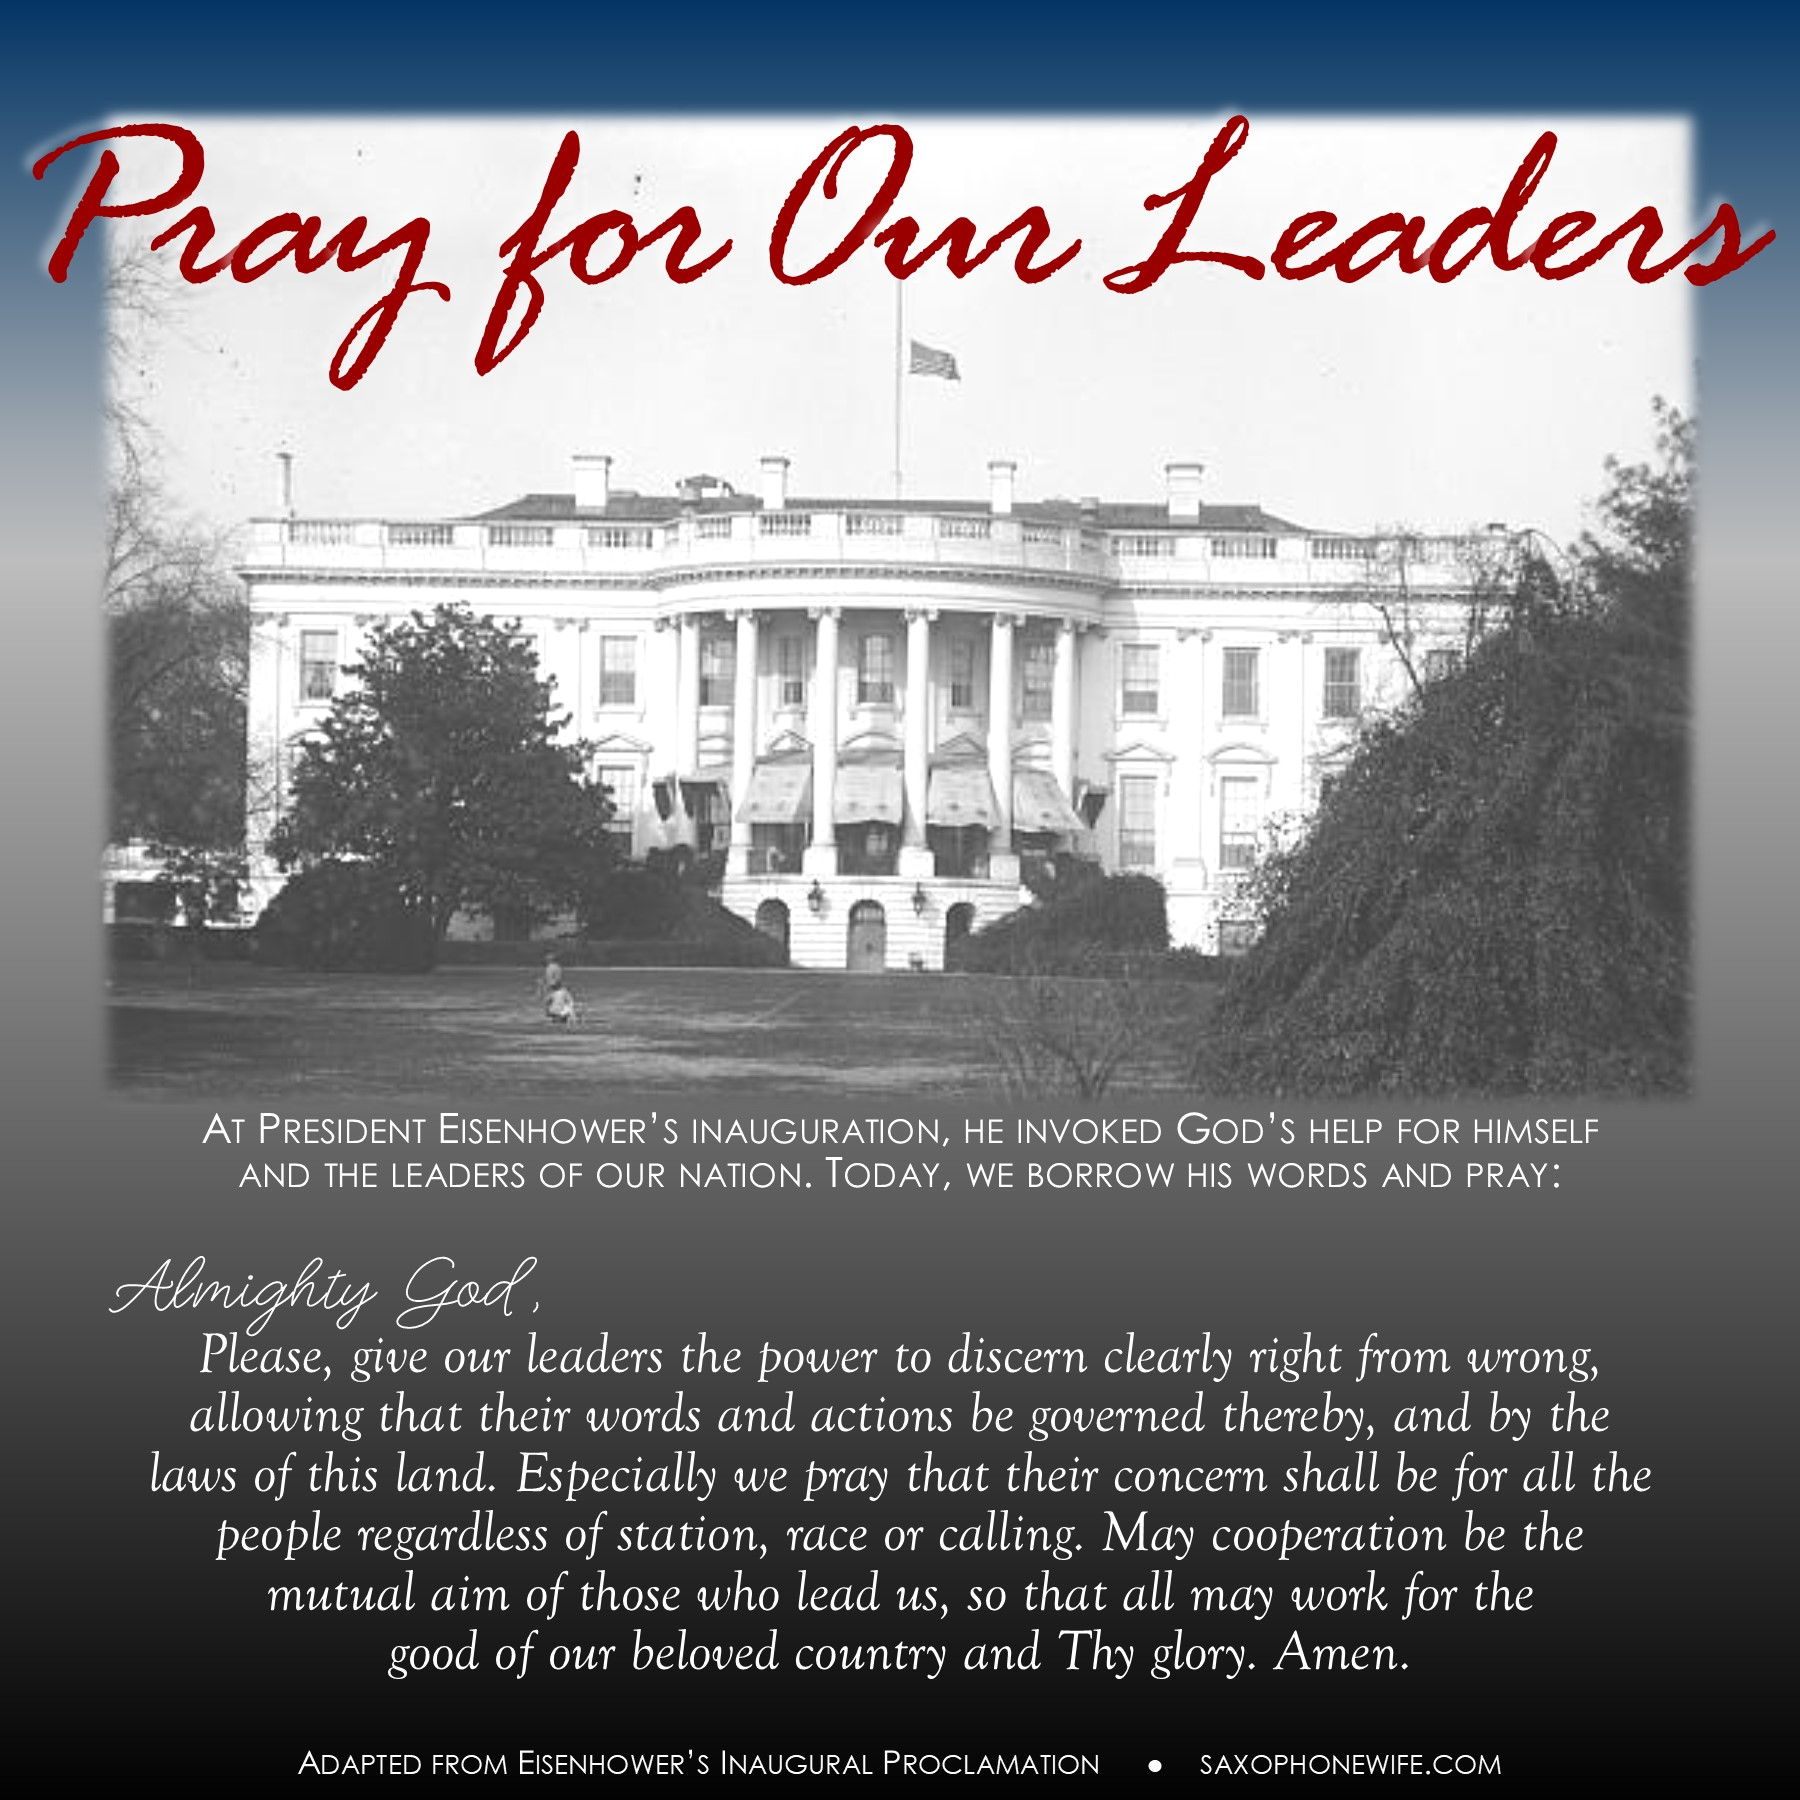 PrayForOurLeaders